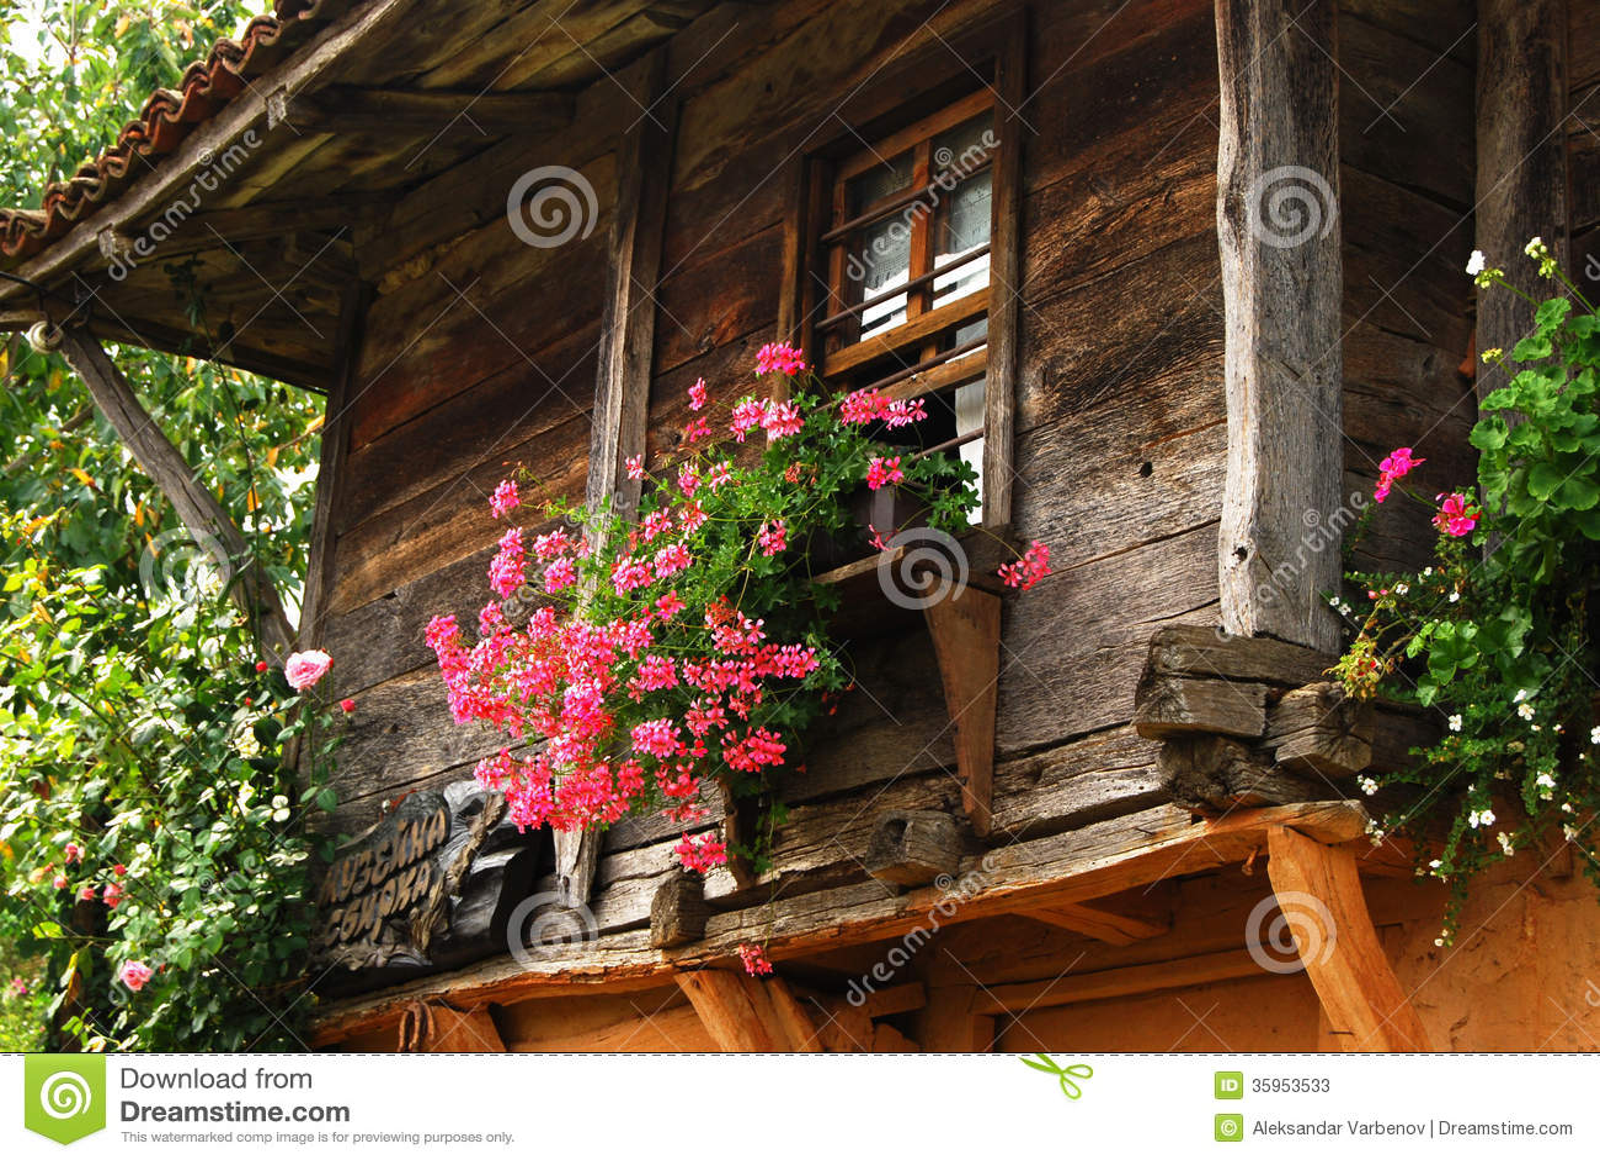 Ventana de madera de la casa de campo